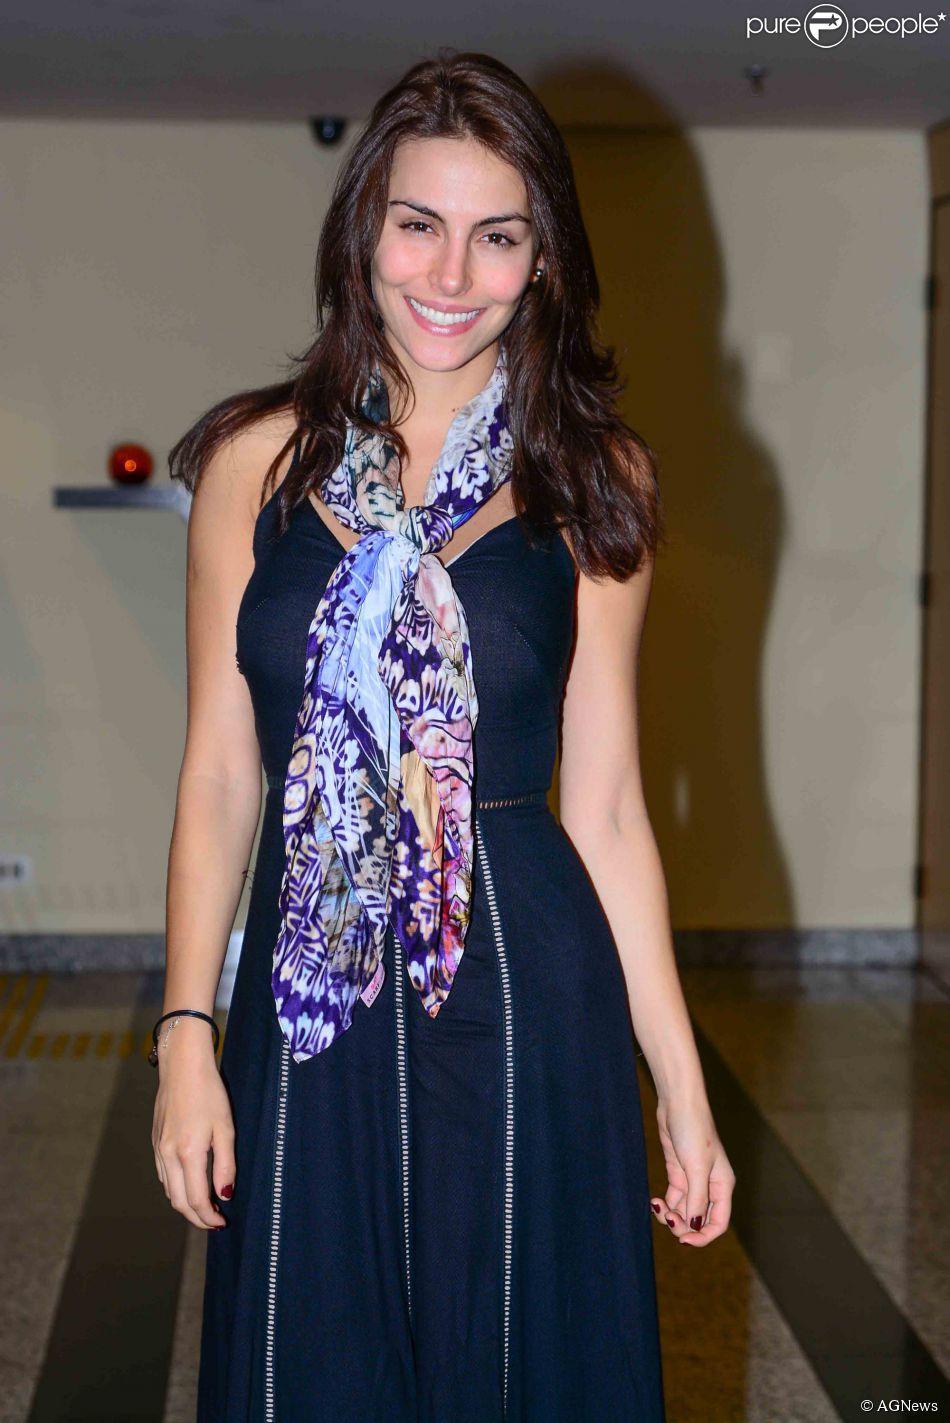 mel fronckowiak, miss bottom 2008, top 2 de miss mundo brasil 2007. - Página 2 Ax956r96